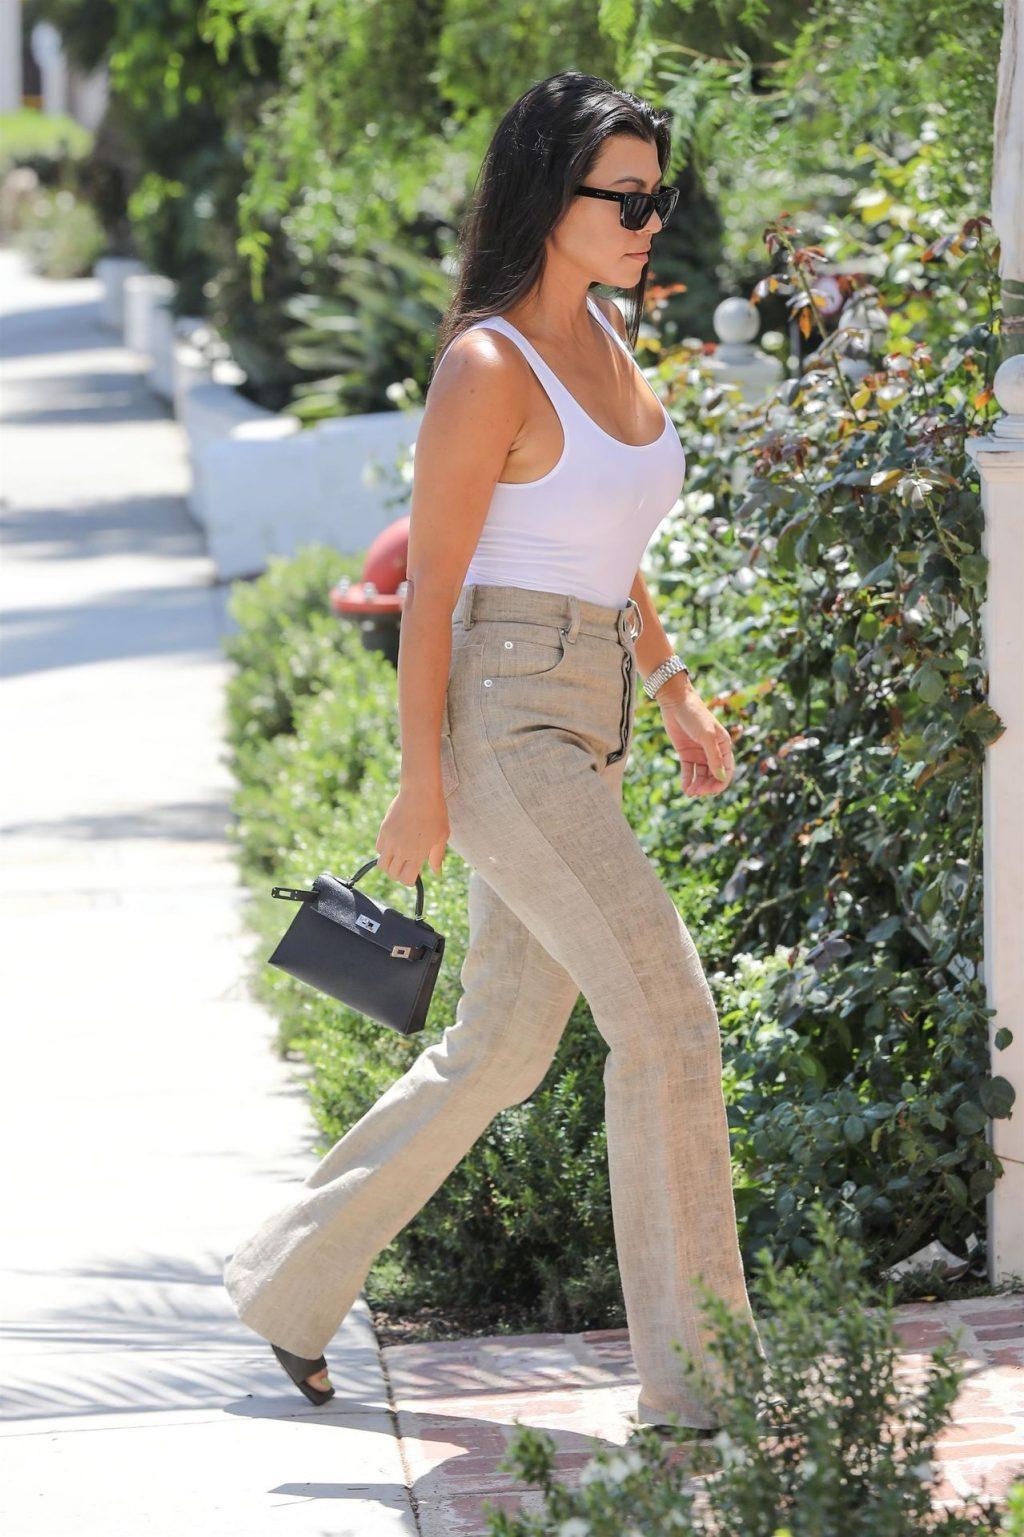 Kourtney Kardashian See Through Thefappeningblog Com 20 1024